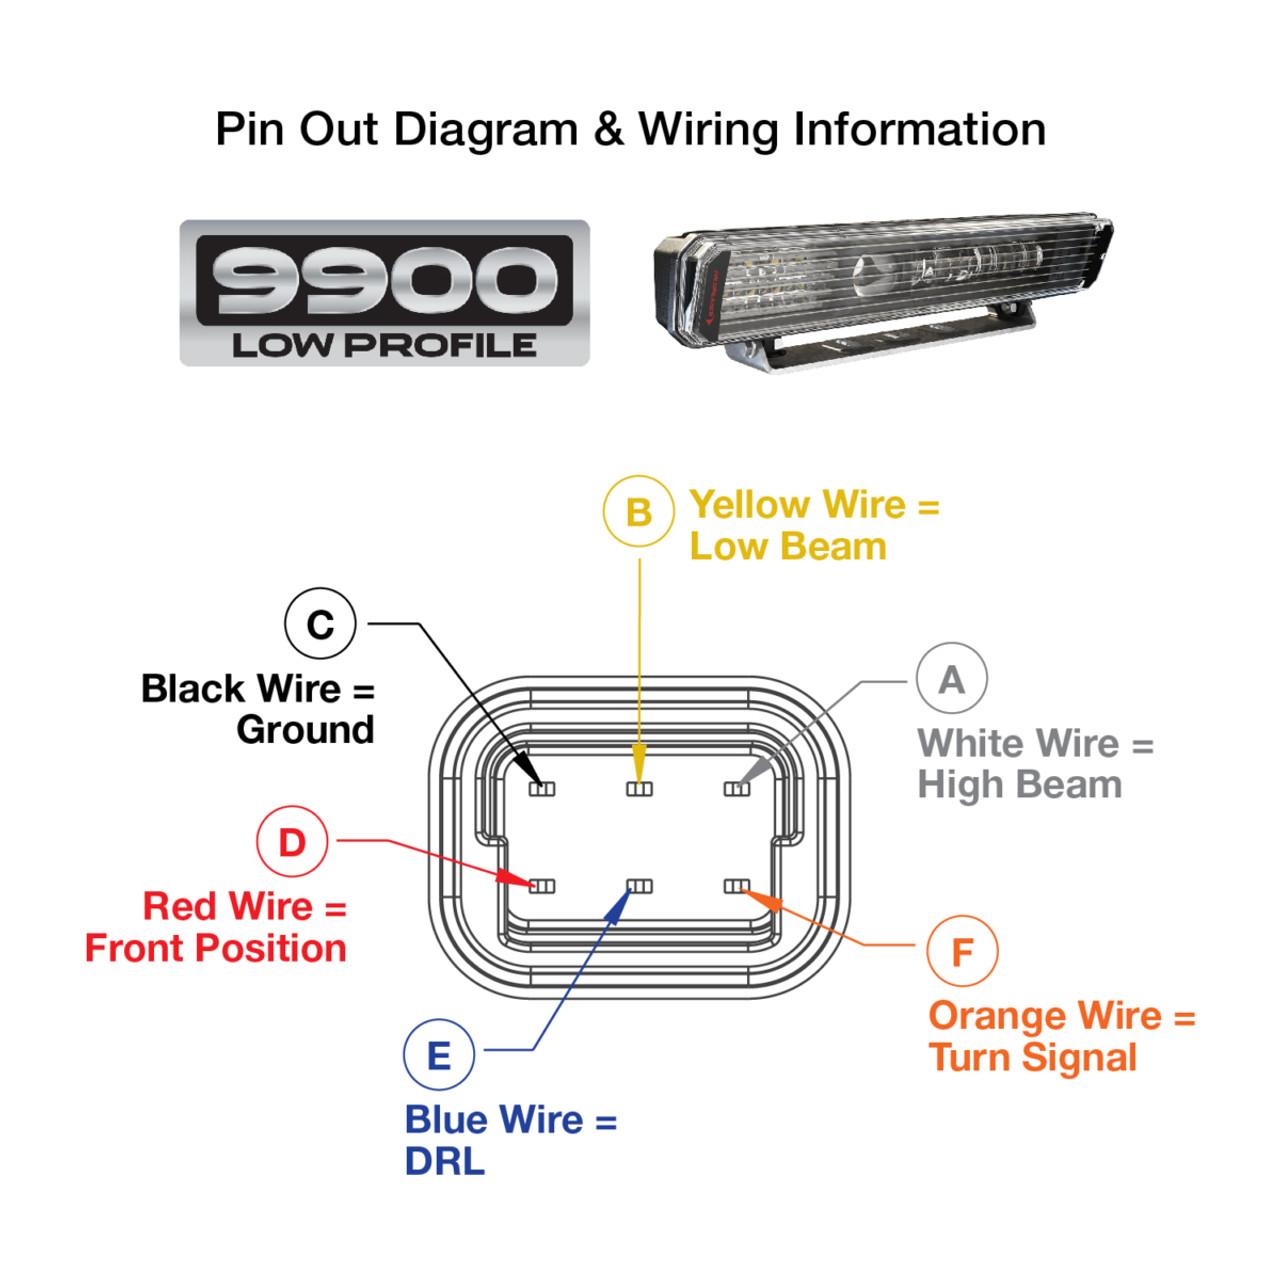 Beam Propane Conversion Wiring Diagram - Land Rover Defender Indicator Wiring  Diagram | Bege Wiring Diagram | Beam Propane Conversion Wiring Diagram |  | Bege Wiring Diagram